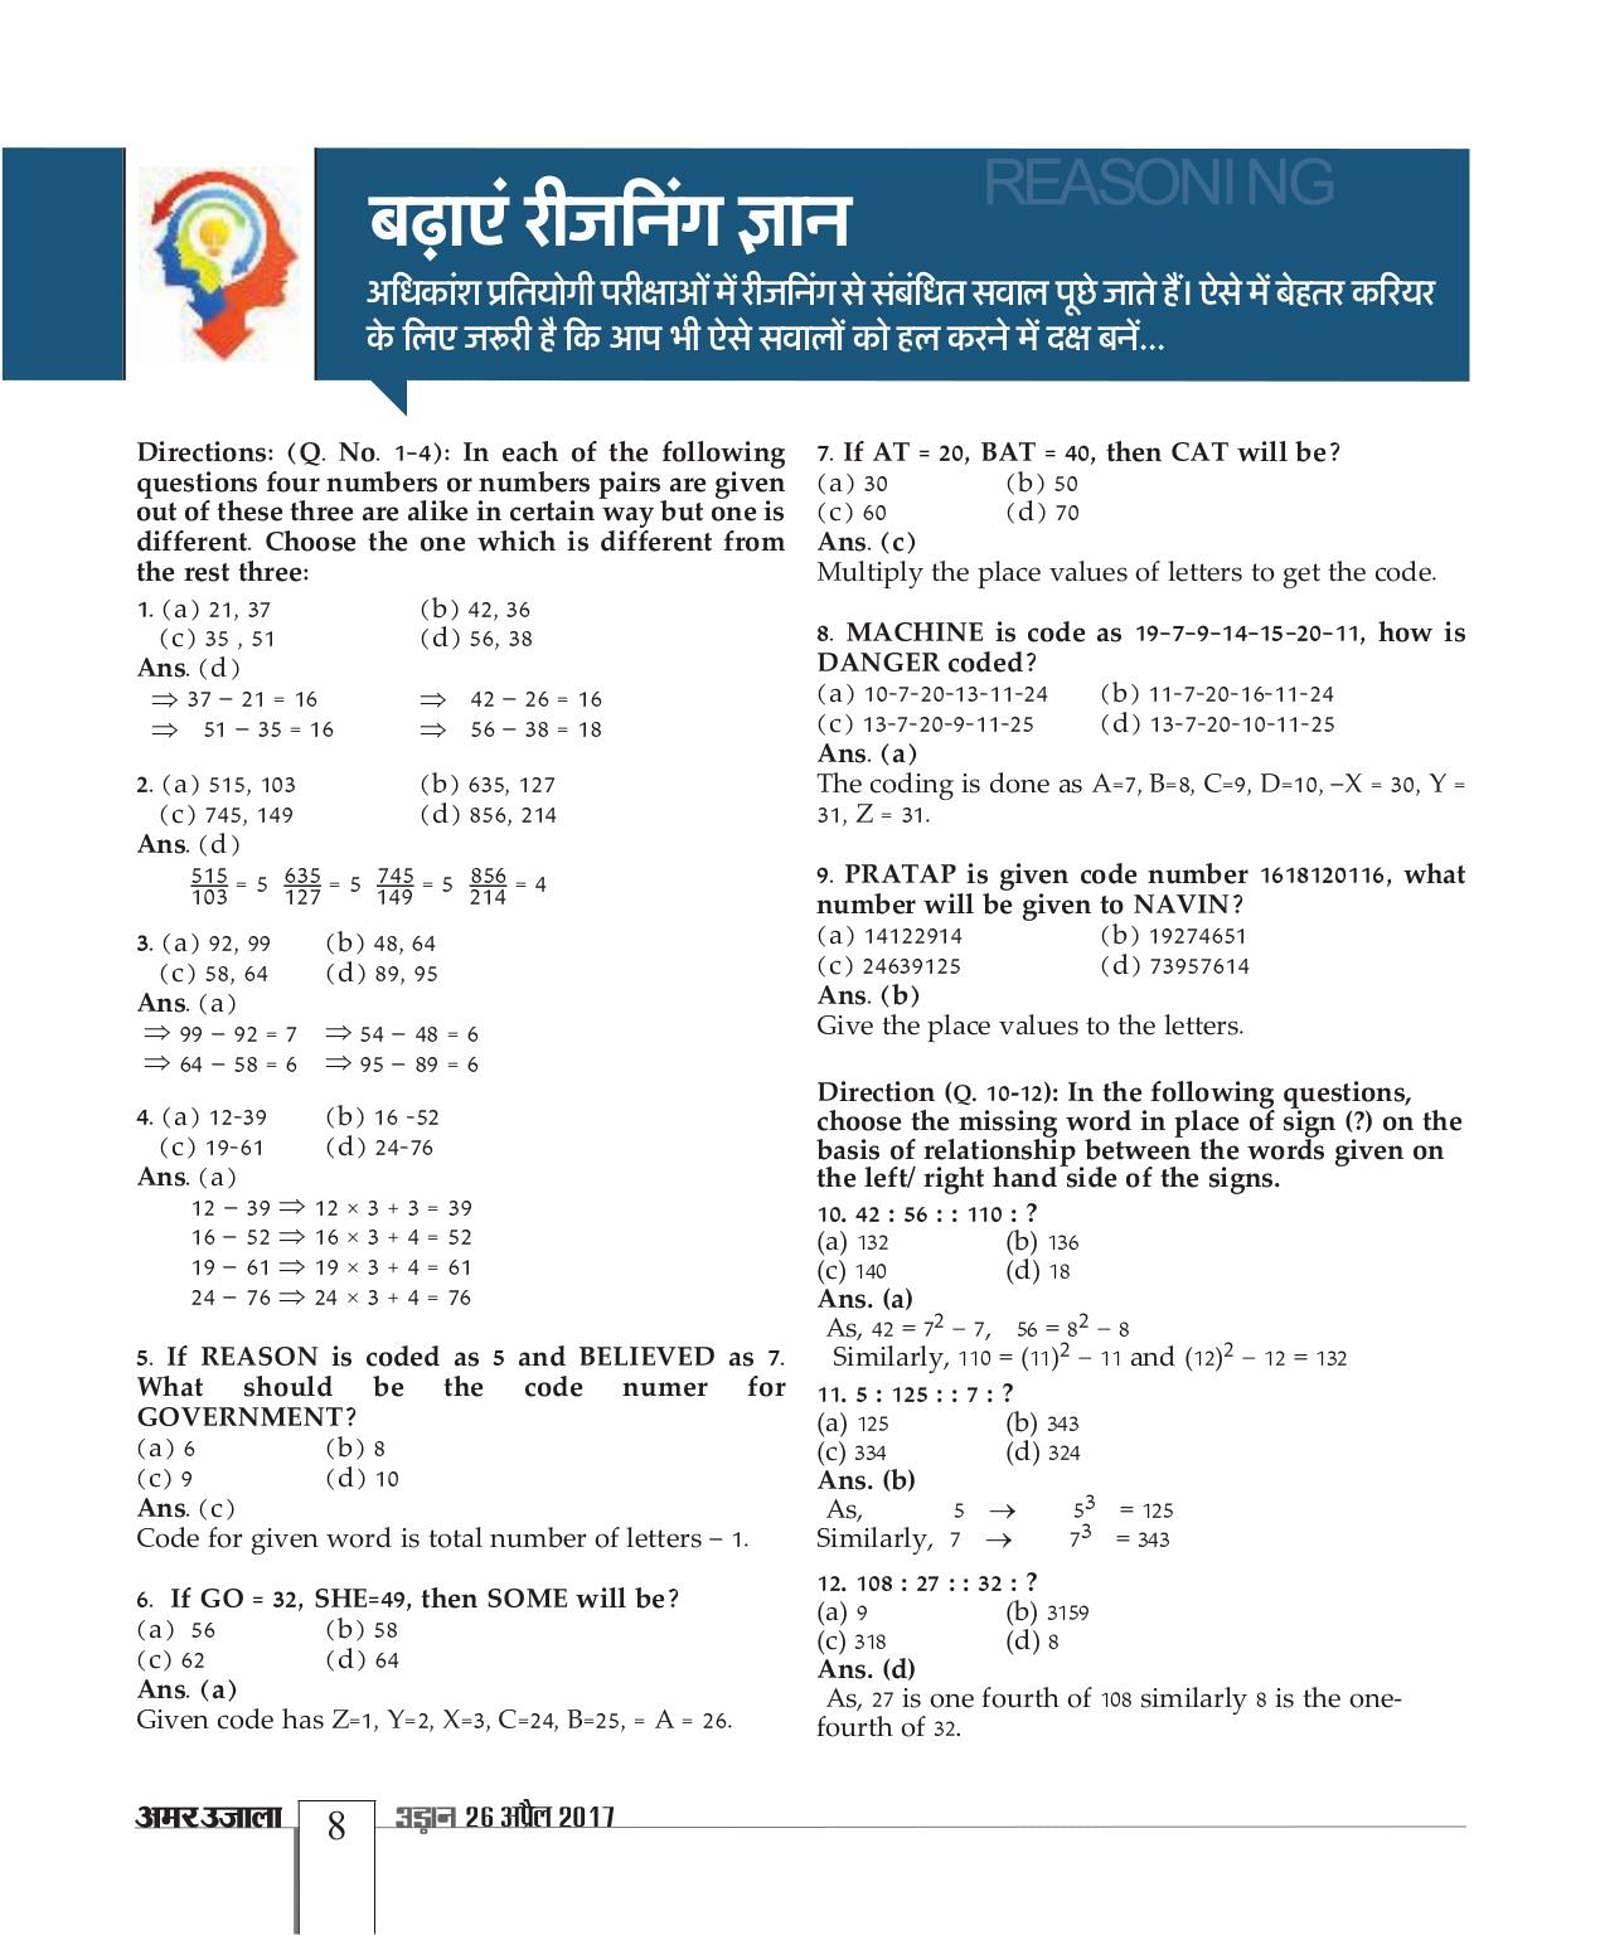 Amarujala Epaper Agra Dehat: Hindi E-paper, Today Agra Dehat